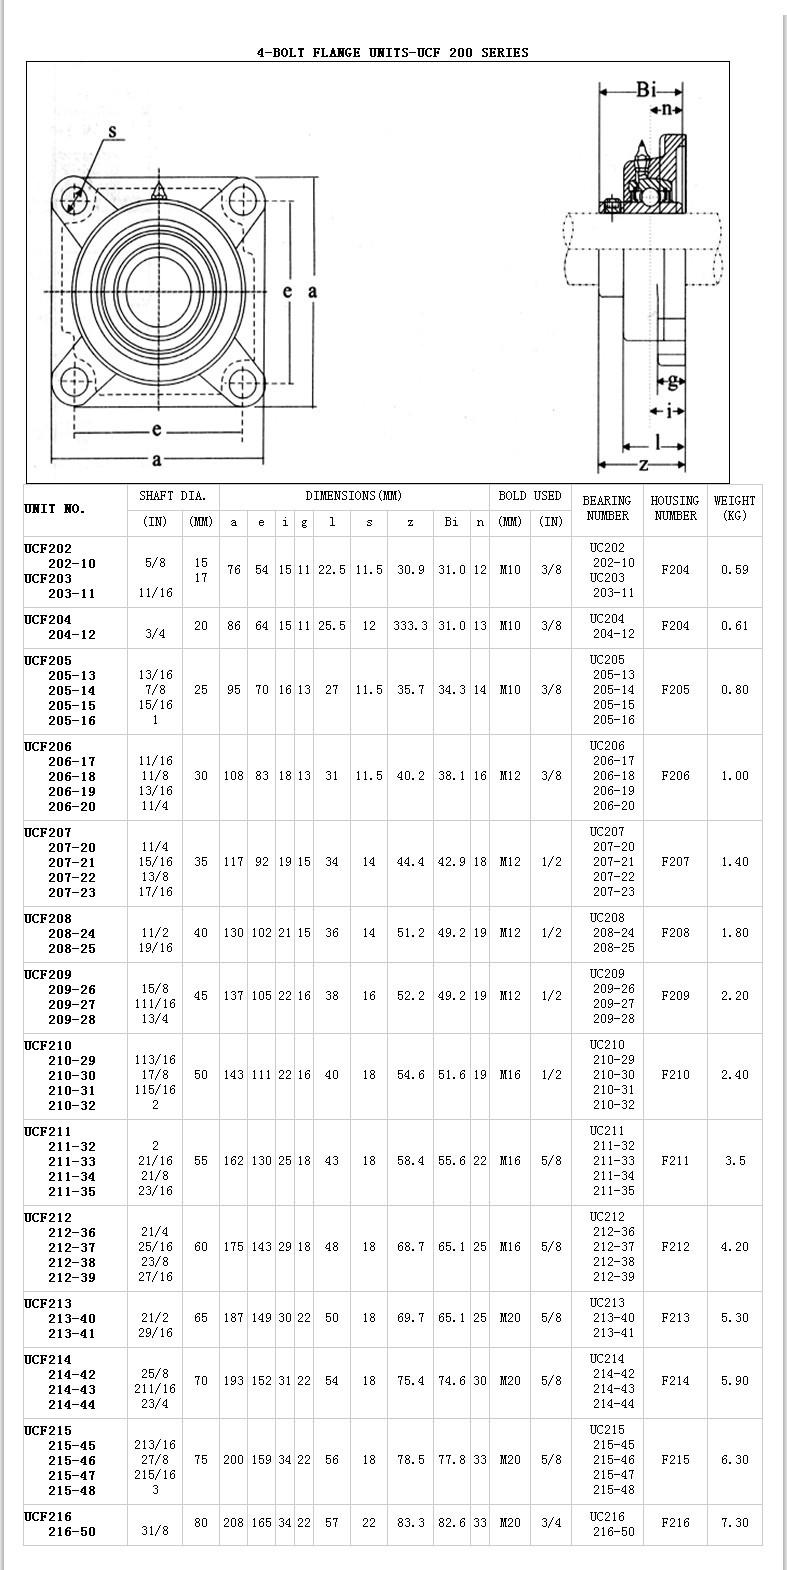 UCF202 |  202-10 |  UCF203 |  203-11 |  UCF204 |  204-12 |  UCF205 |  205-13 |  205-14 |  205-15 |  205-16 |  UCF206 |  206-17 |  206-18 |  206-19 |  206-20 |  UCF207 |  207-20 |  207-21 |  207-22 |  207-23 |  UCF208 |  208-24 |  208-25 |  UCF209 |  209-26 |  209-27 |  209-28 |  UCF210 |  210-29 |  210-30 |  210-31 |  210-32 |  UCF211 |  211-32 |  211-33 |  211-34 |  211-35 |  UCF212 |  212-36 |  212-37 |  212-38 |  212-39 |  UCF213 |  213-40 |  213-41